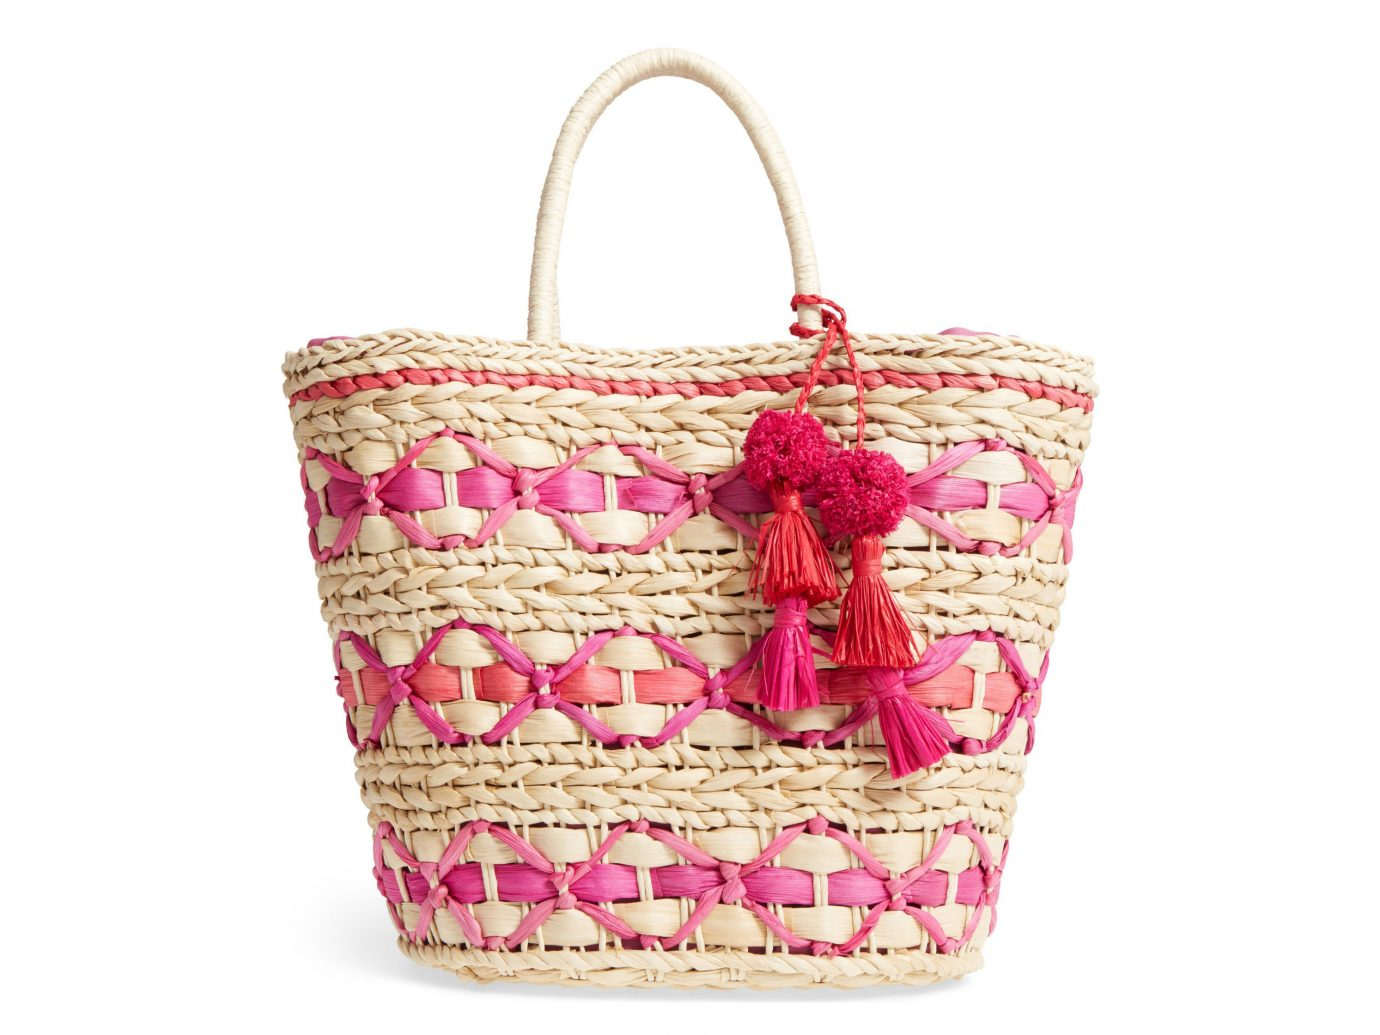 Trip Ideas pink handbag product bag shoulder bag magenta basket tote bag accessory